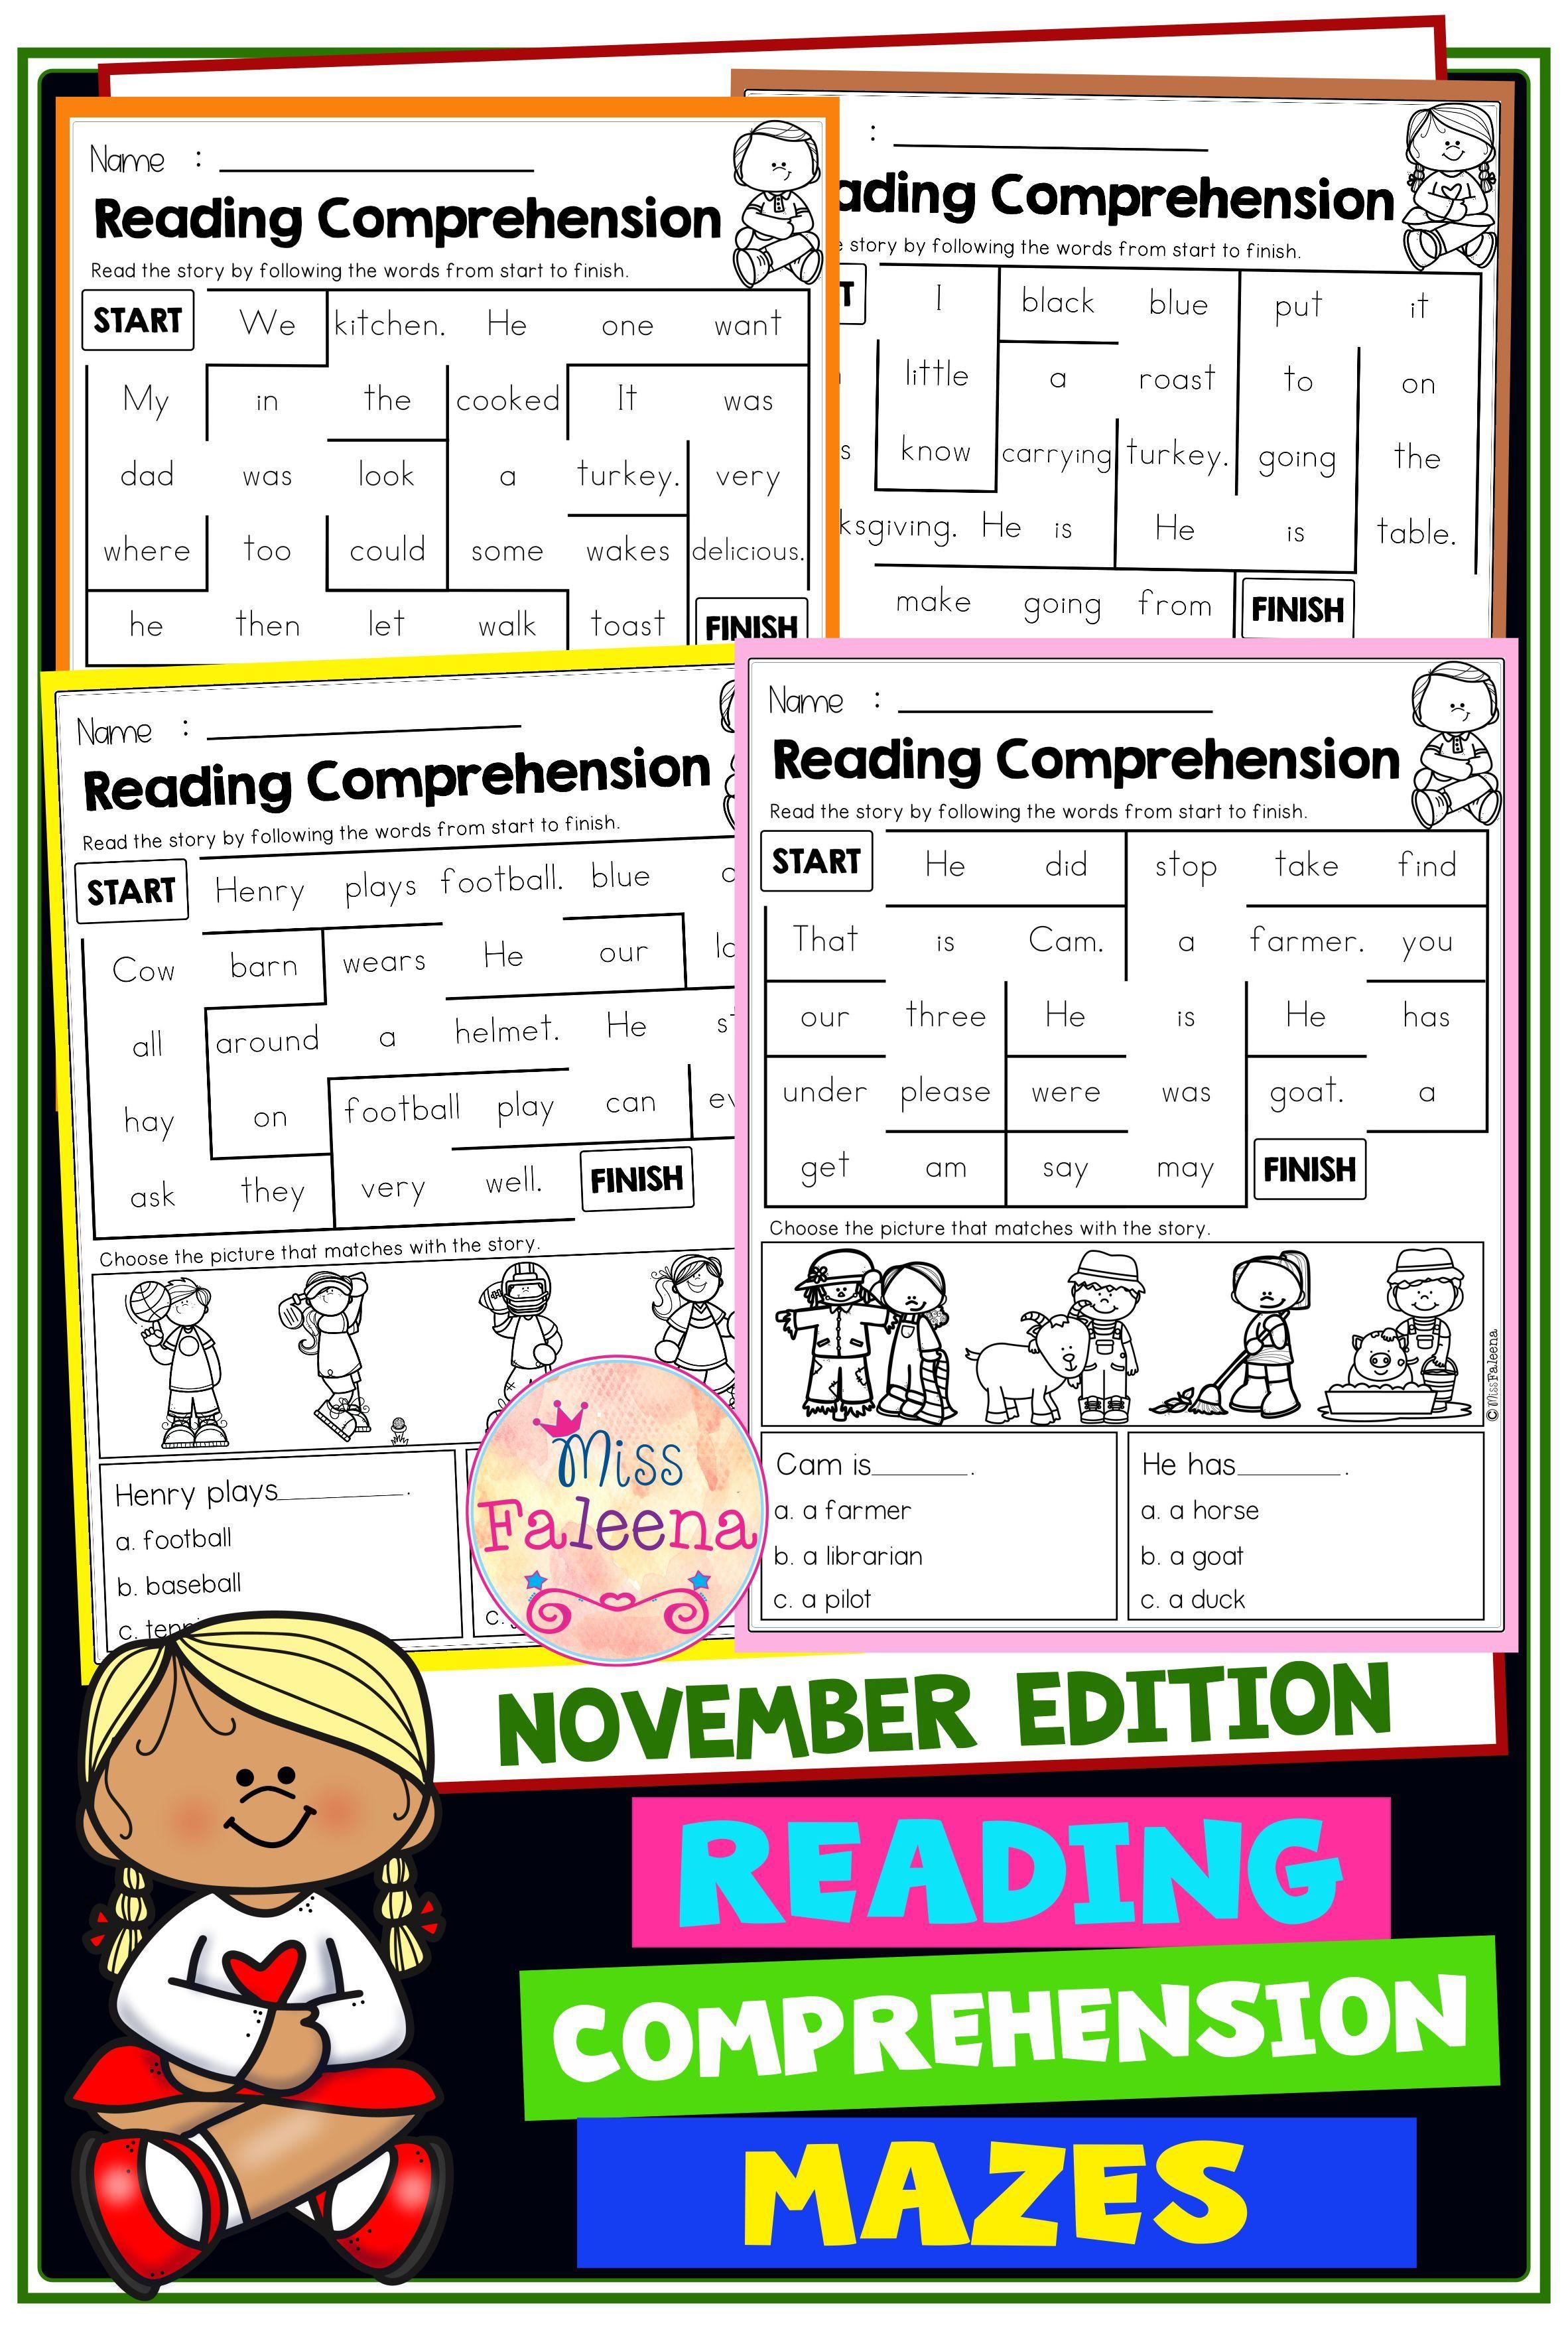 November Reading Comprehension Mazes [ 3544 x 2364 Pixel ]